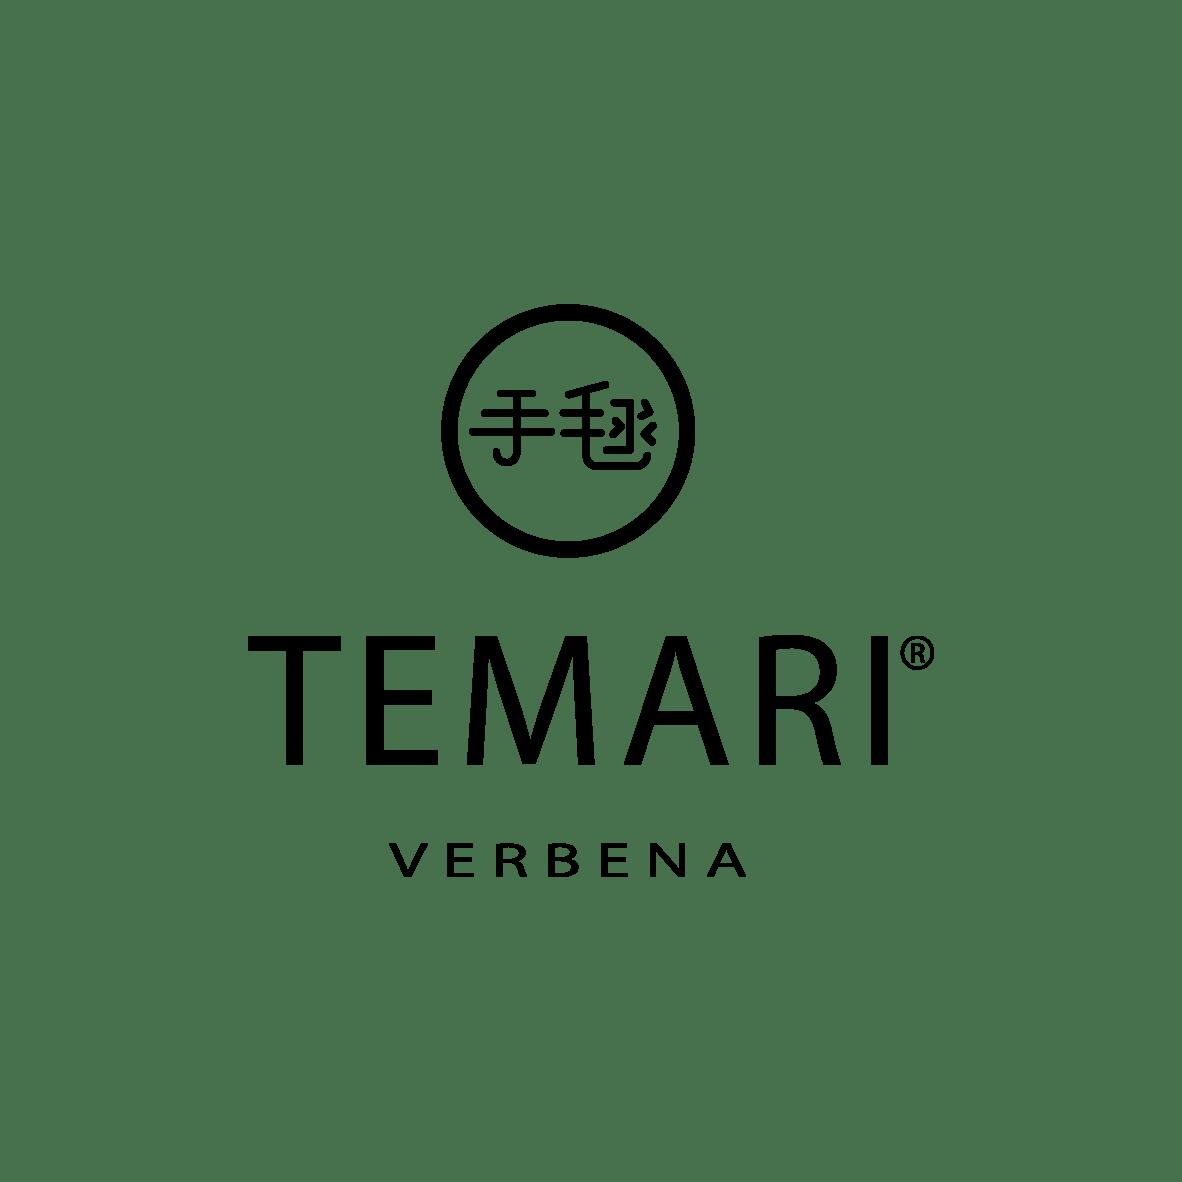 Temari logo black